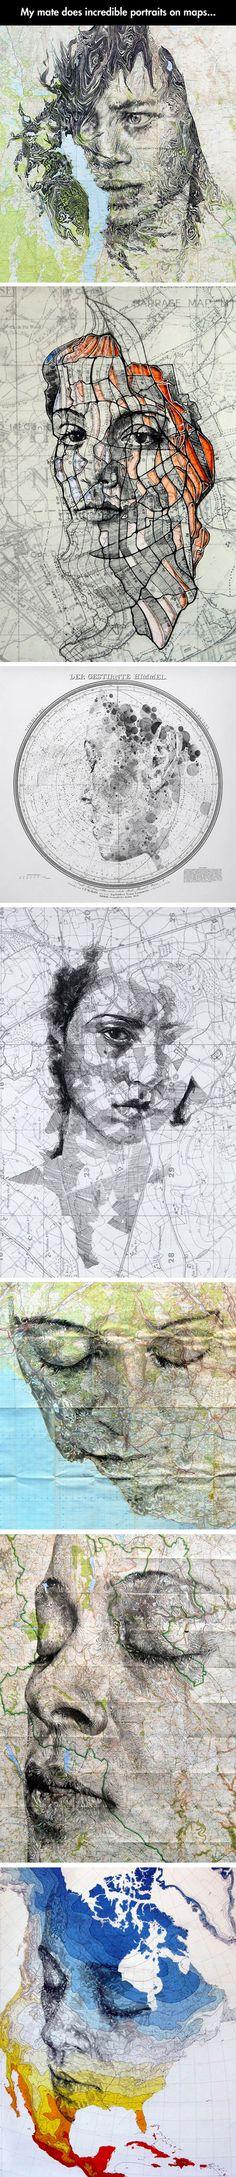 Portraits on maps.